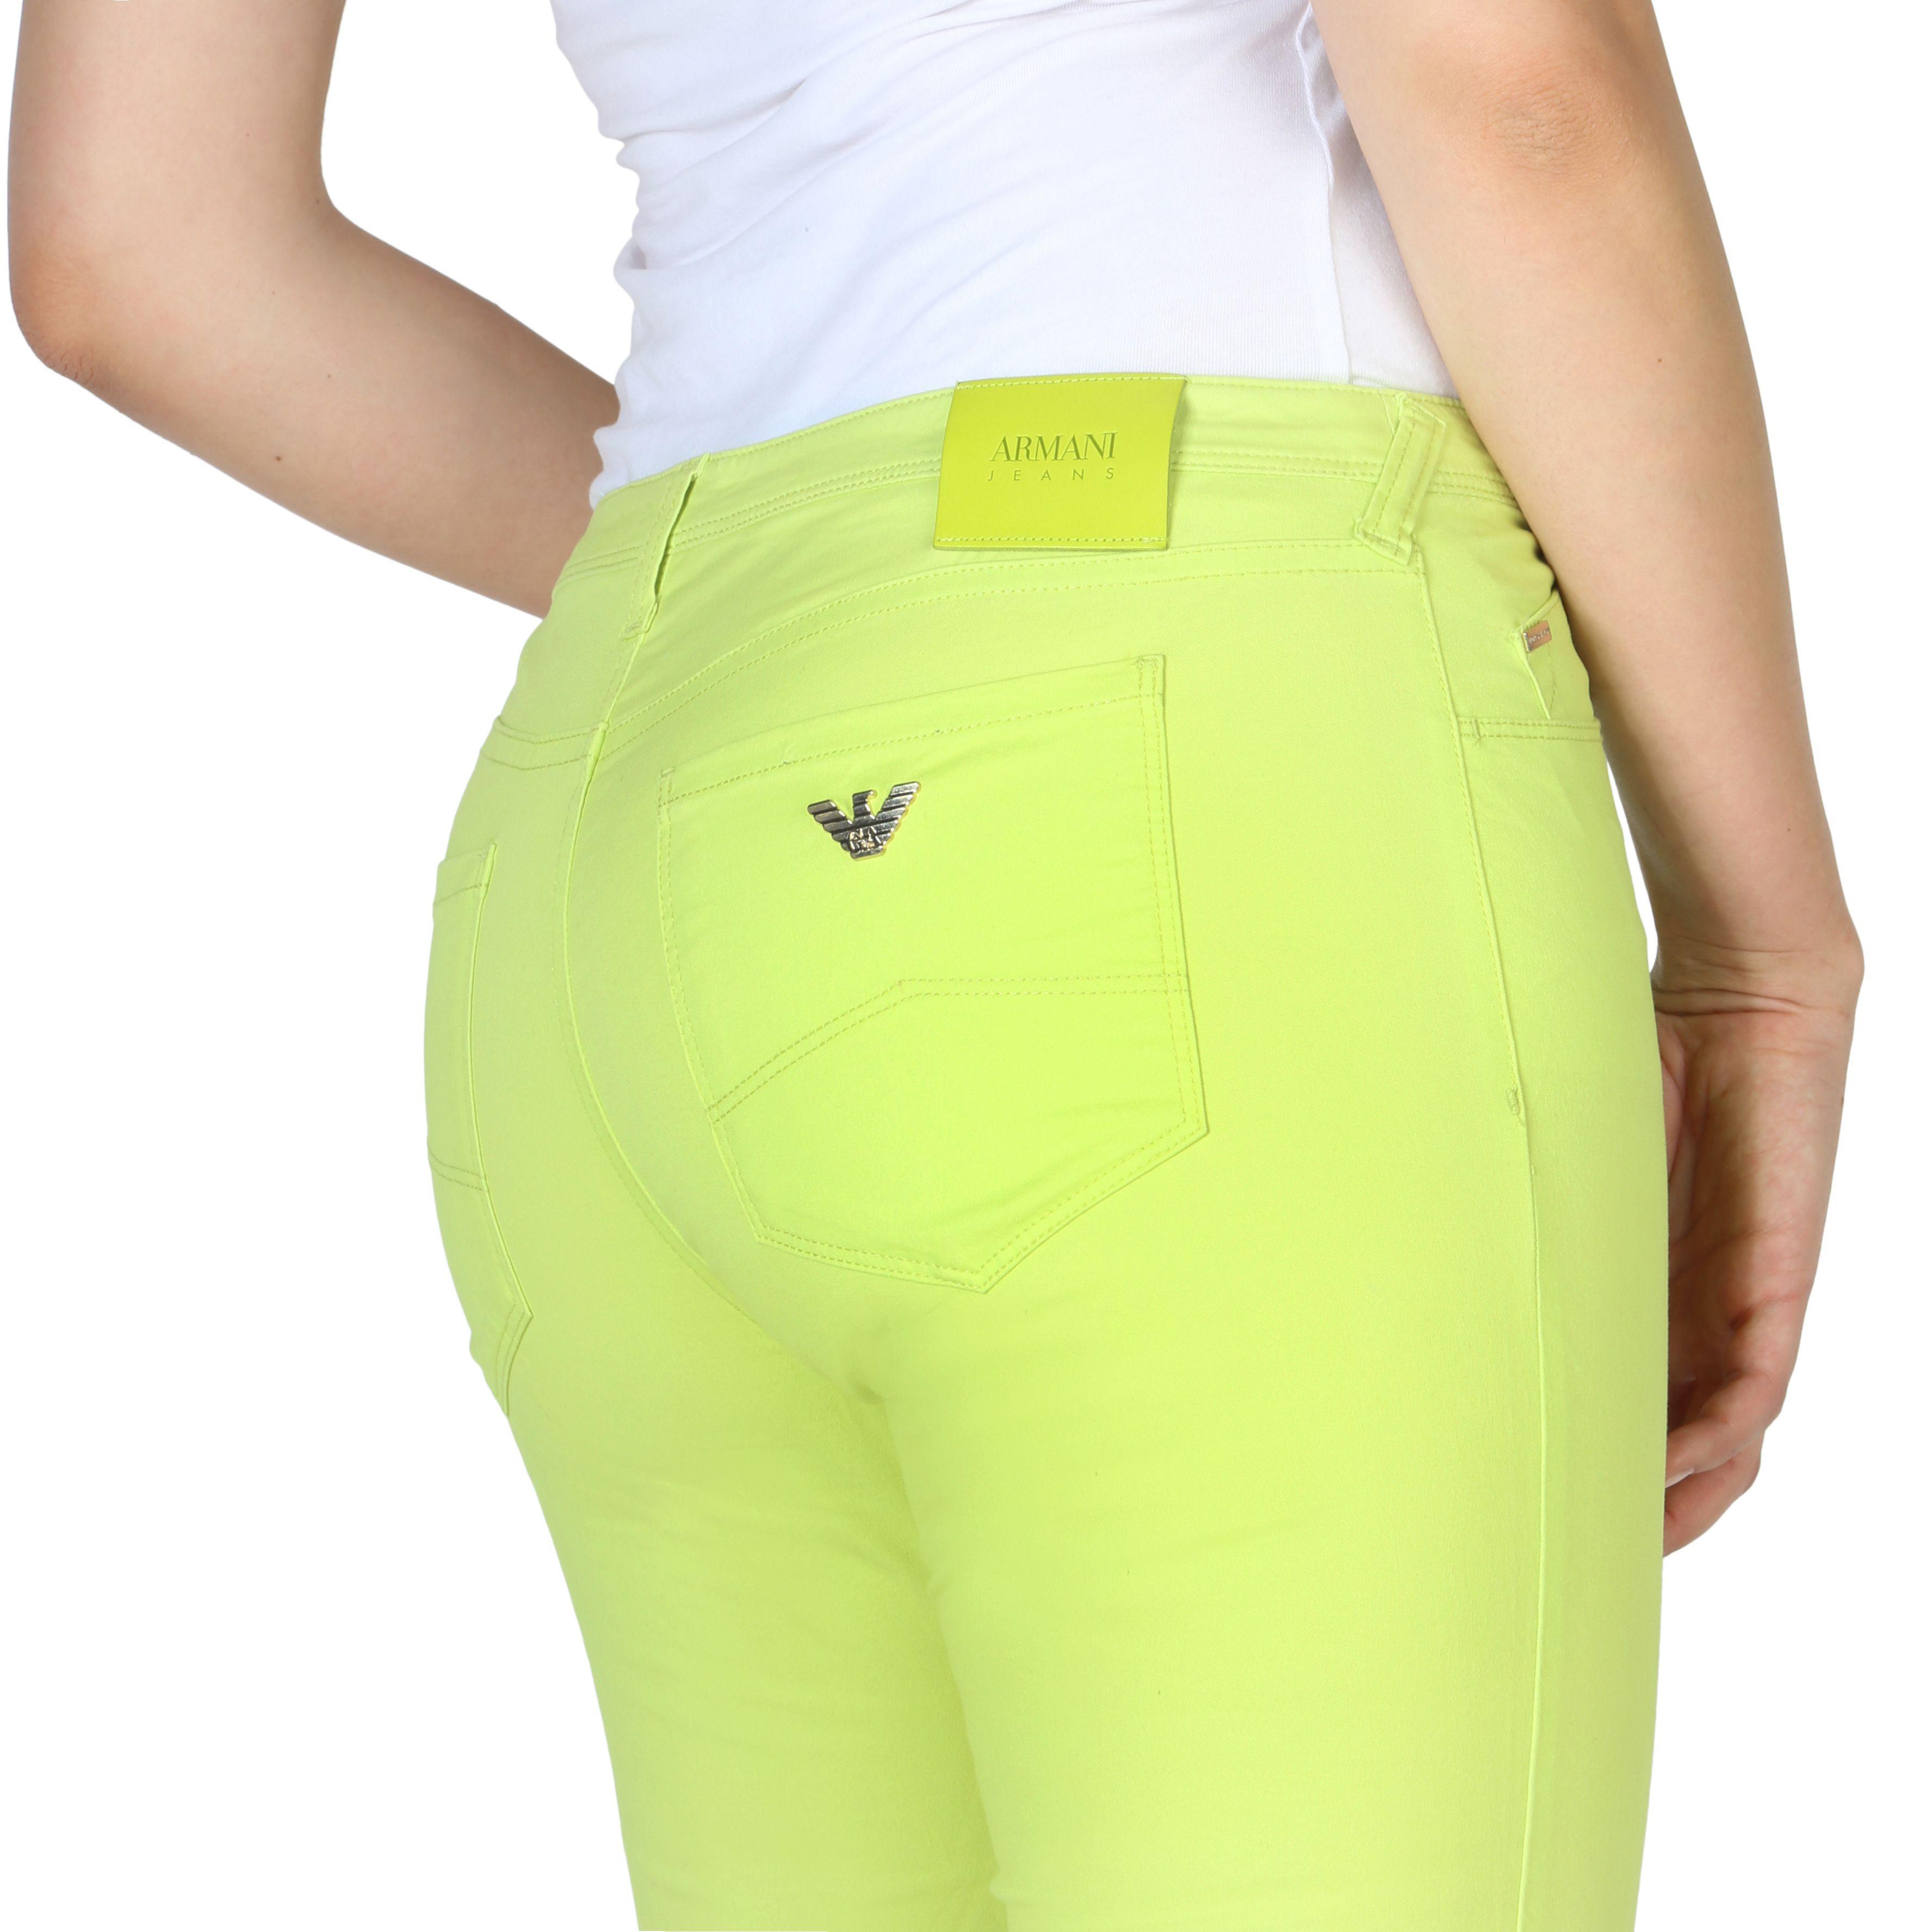 Pantalons Armani Jeans – 3Y5J28_5NZXZ